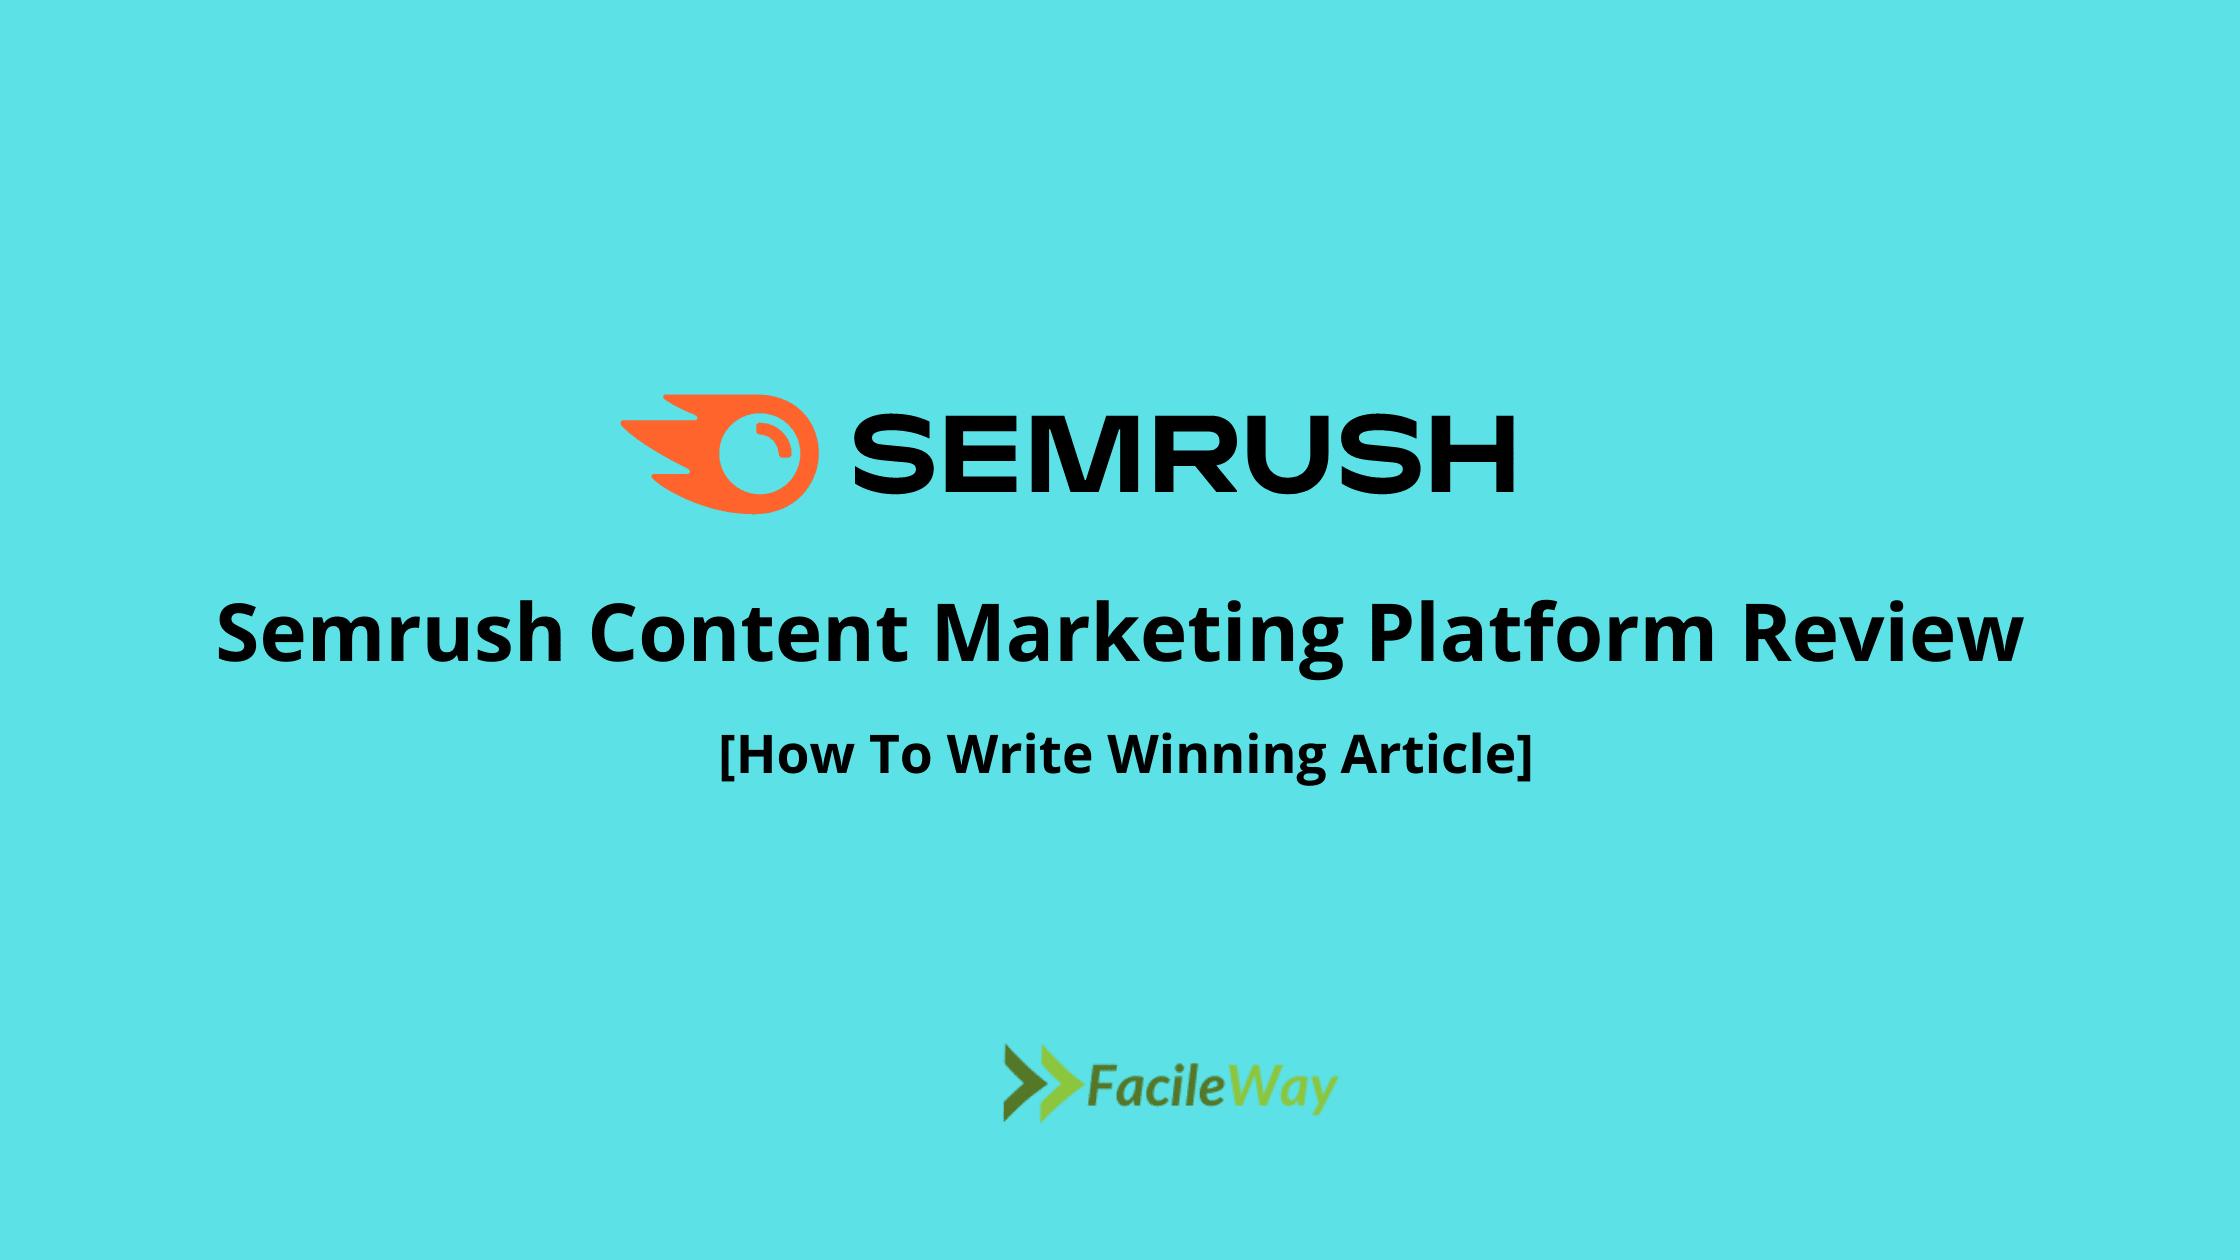 Semrush Content Marketing Platform Review